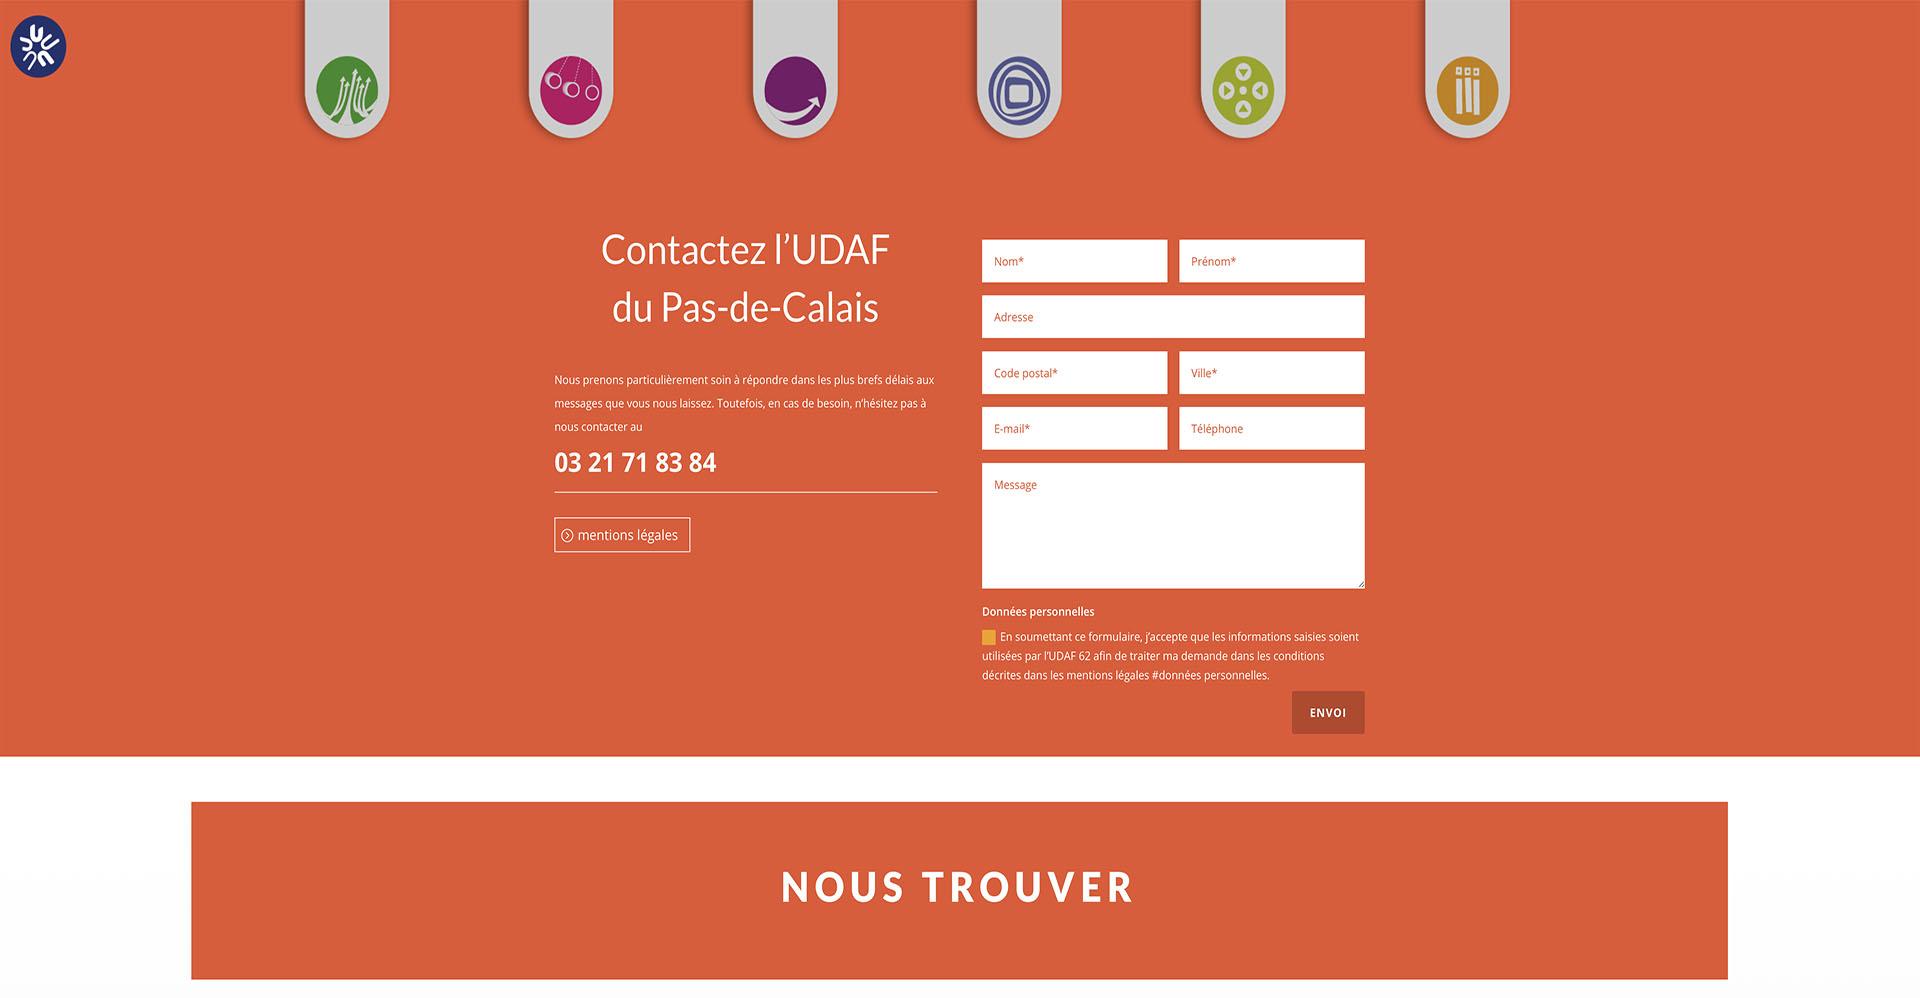 Page contact UDAF 62